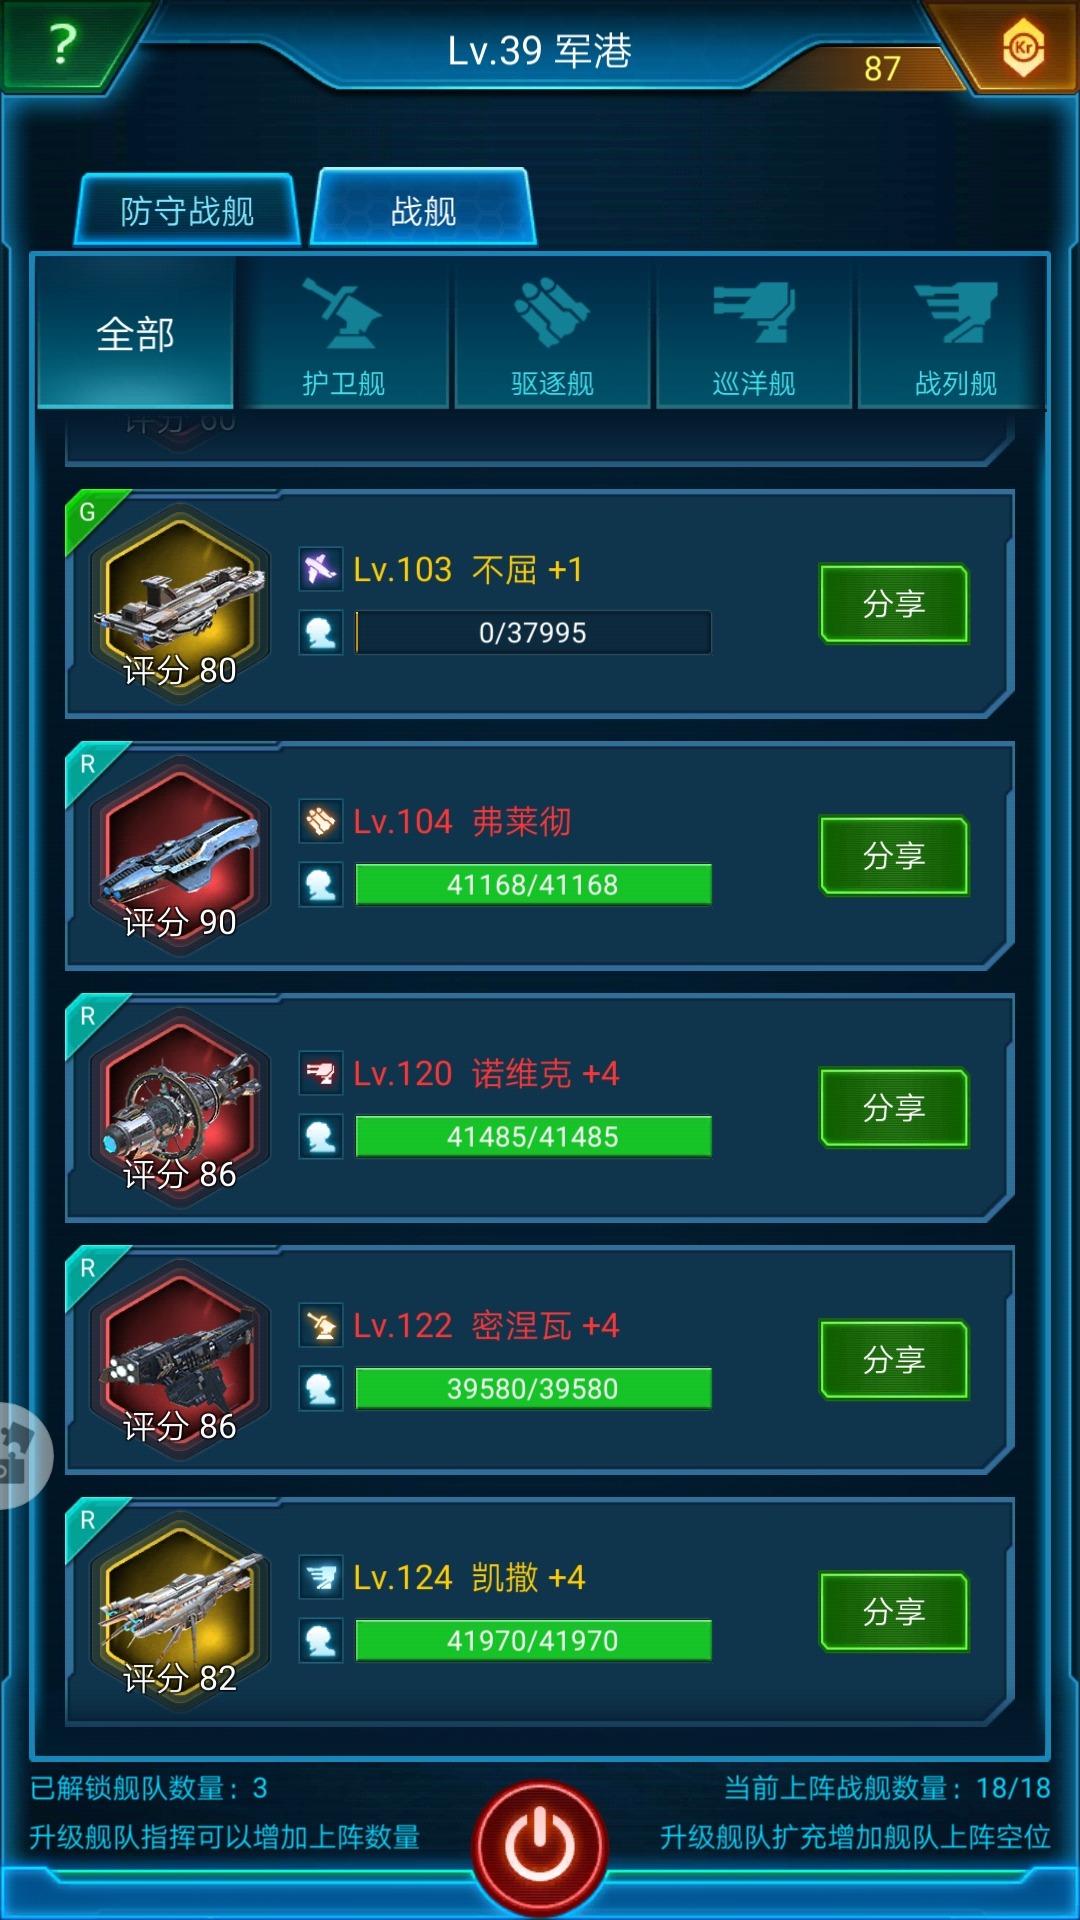 Screenshot_20190730_074439_com.jedigames.p16s.huawei.jpg